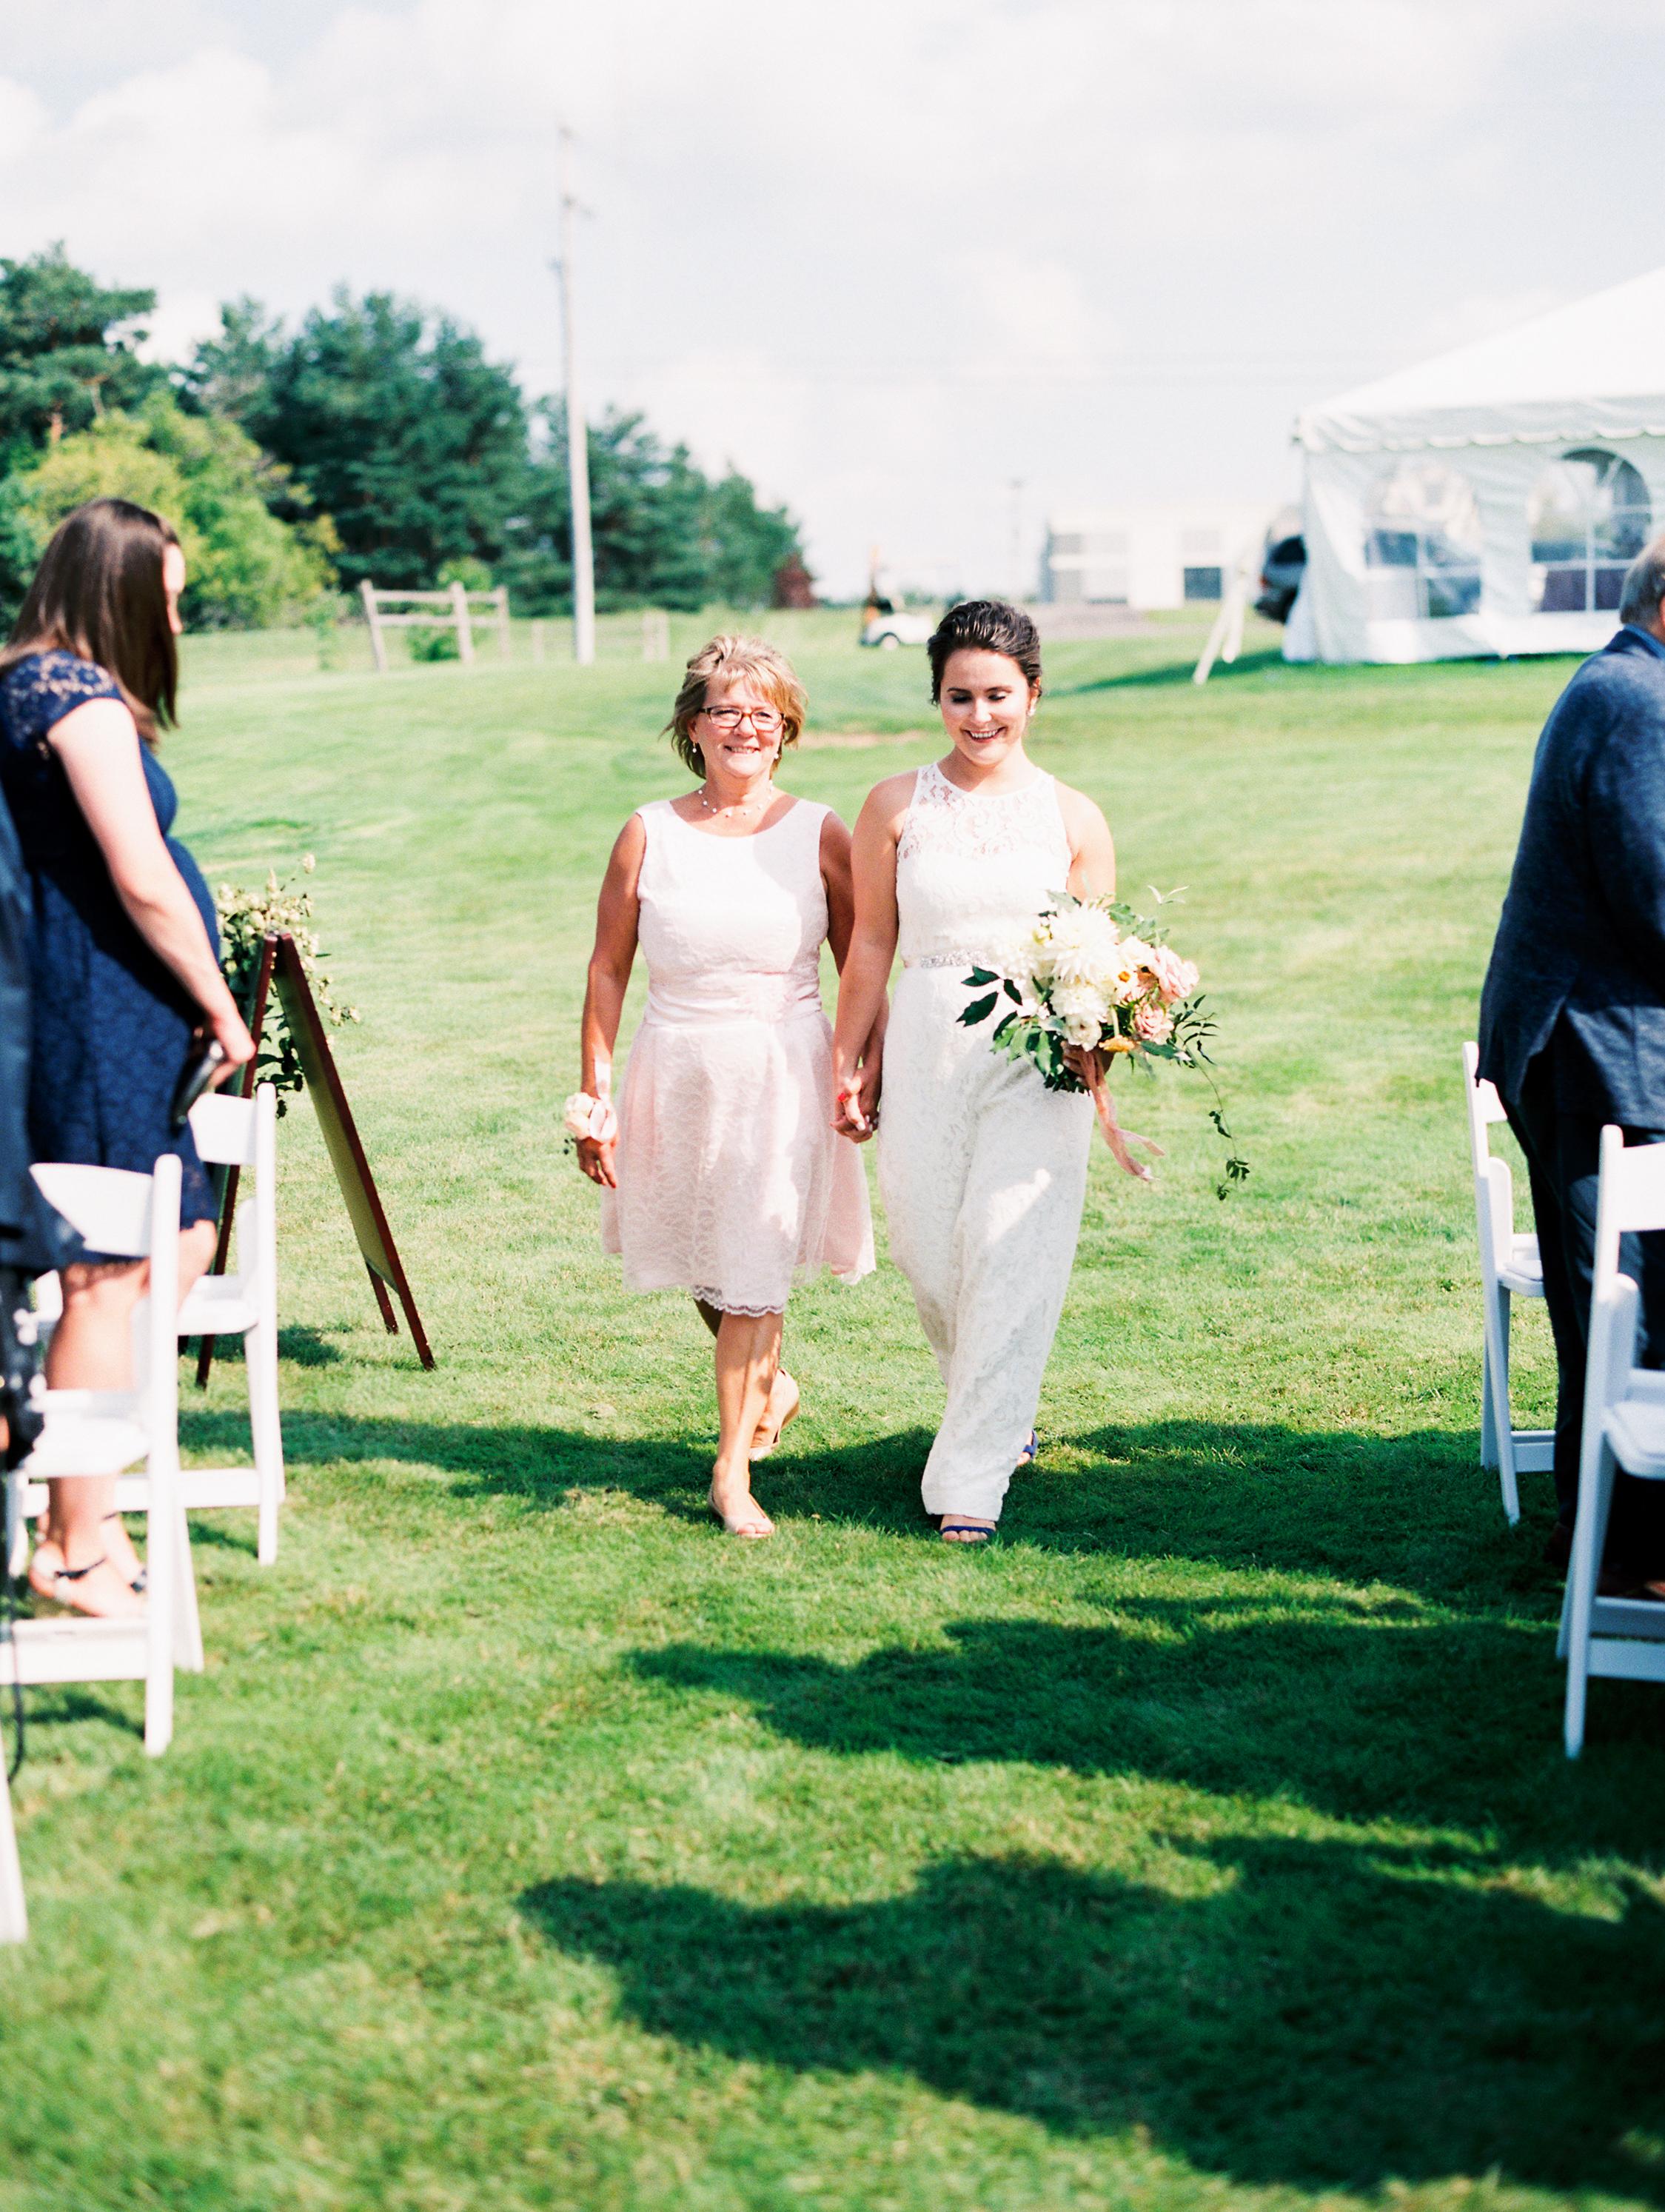 Zoller+Wedding+Ceremonyf-1.jpg